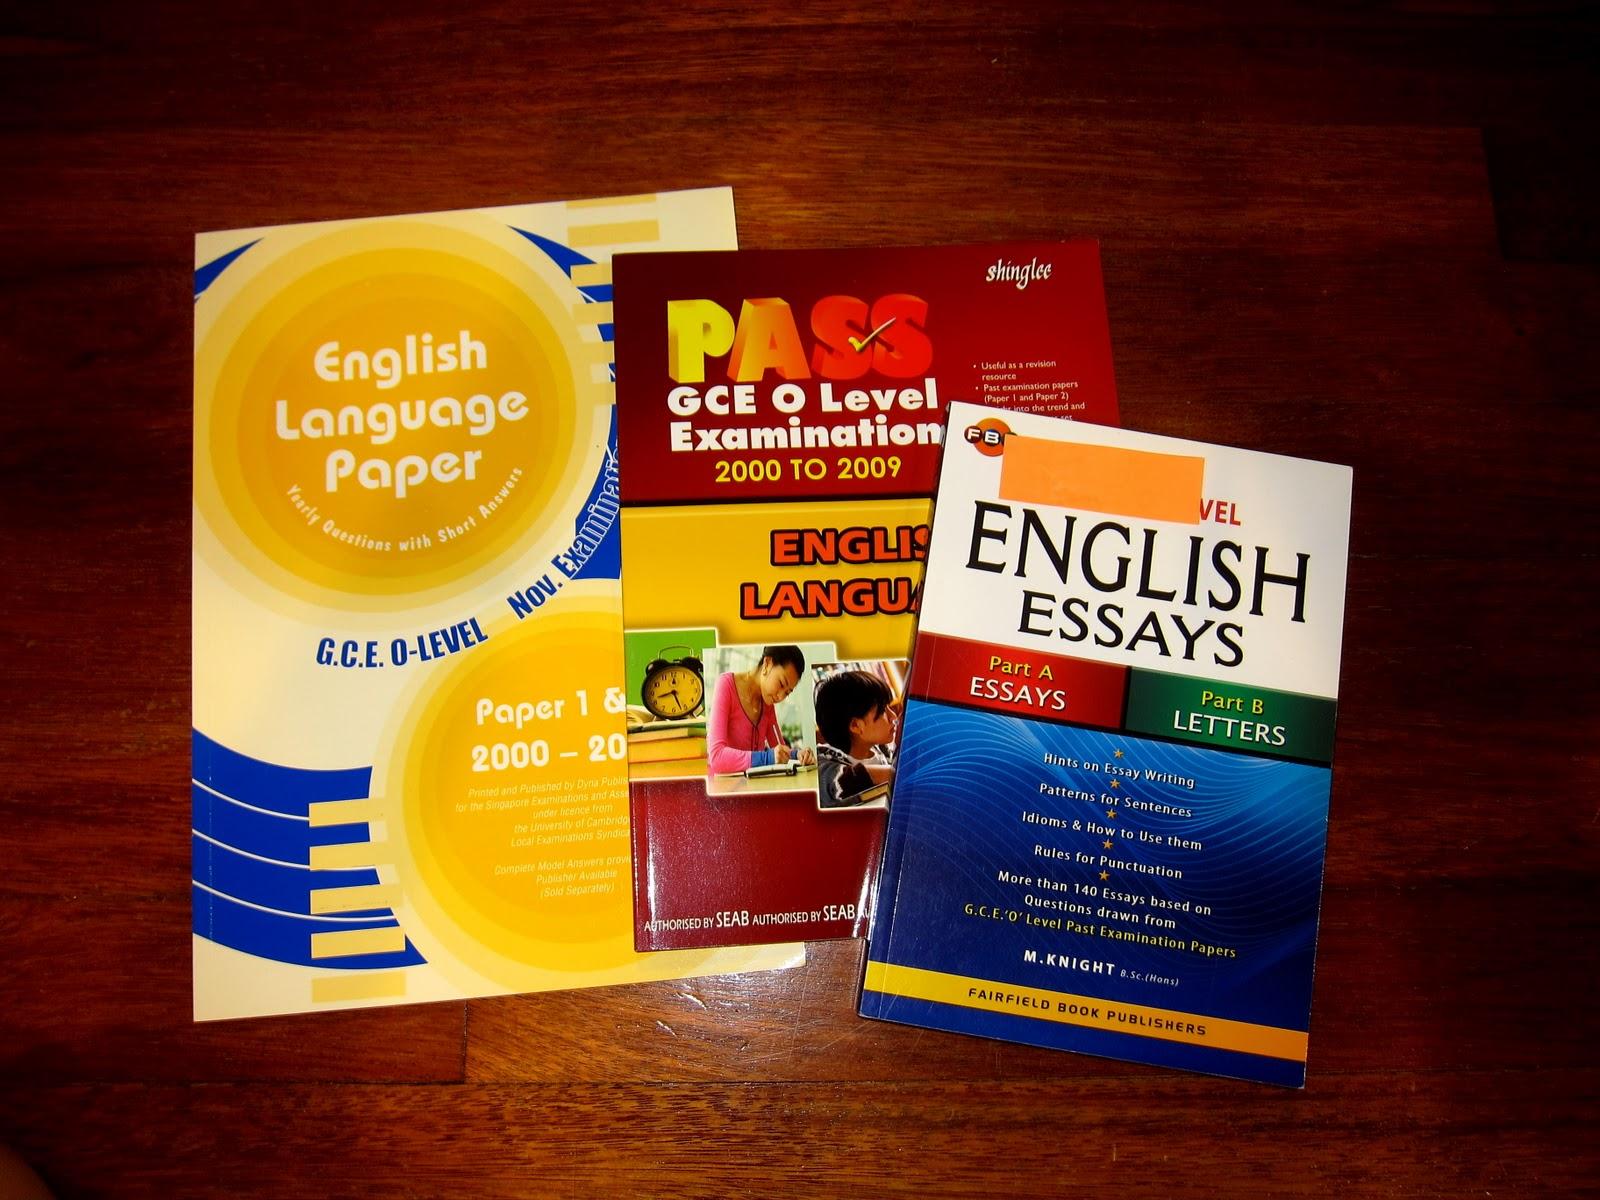 searching for bobby fischer essay Spanish A Level literature model essay _ Lorca _ Bodas de Sangre